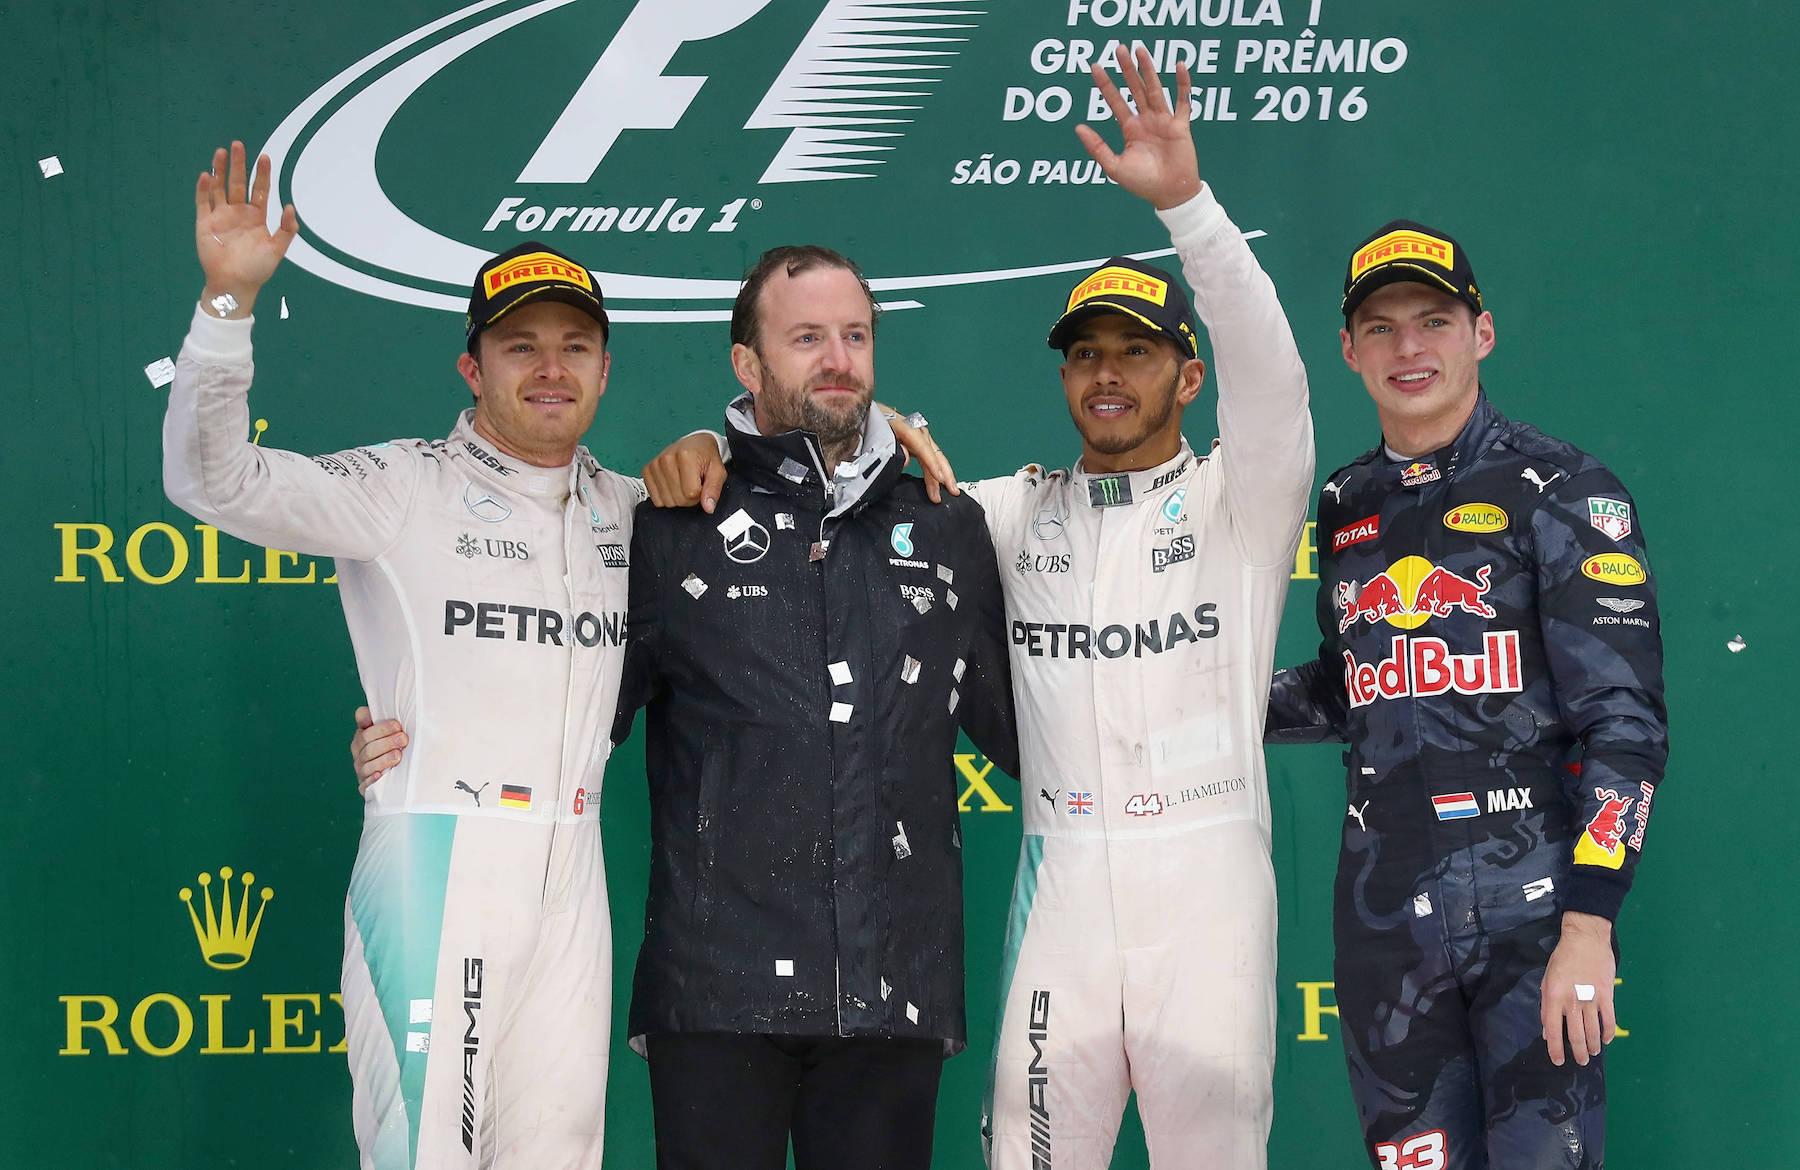 Salracing - Brazilian Grand Prix Podium